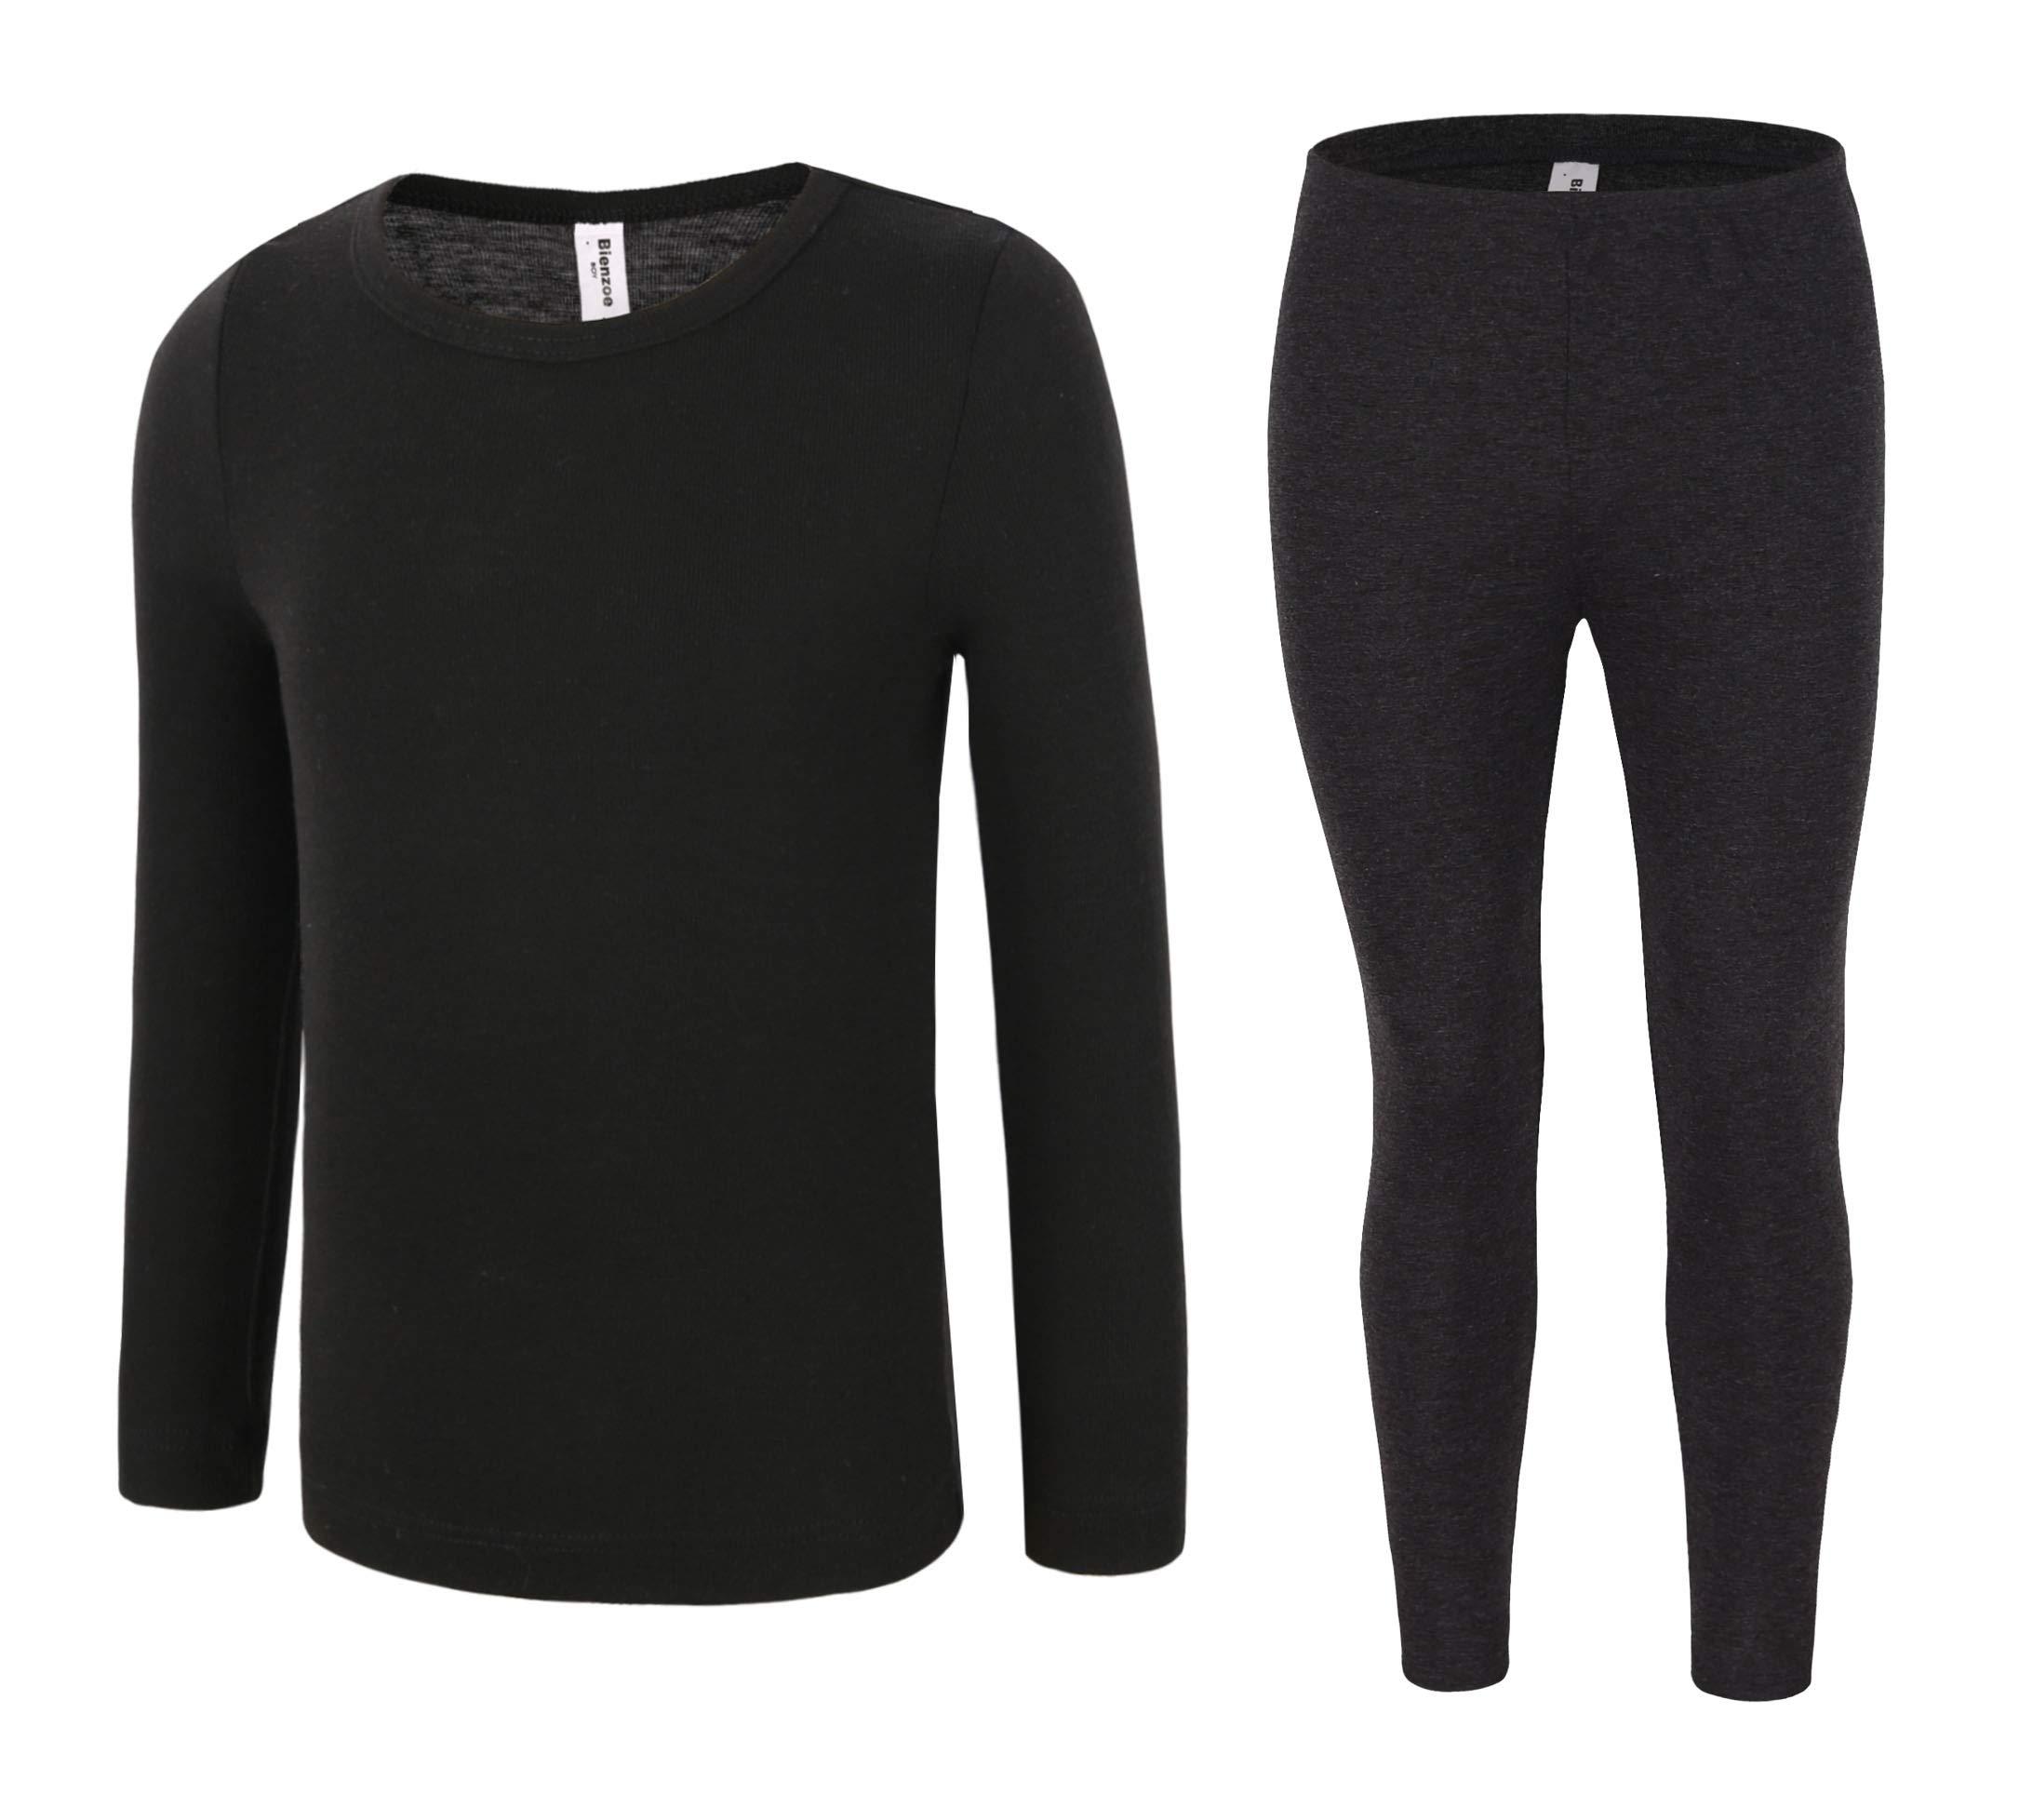 Bienzoe Boy's High Tech Fiber Thermals Long Johns Tops & Pants Set 10/12 Black by Bienzoe